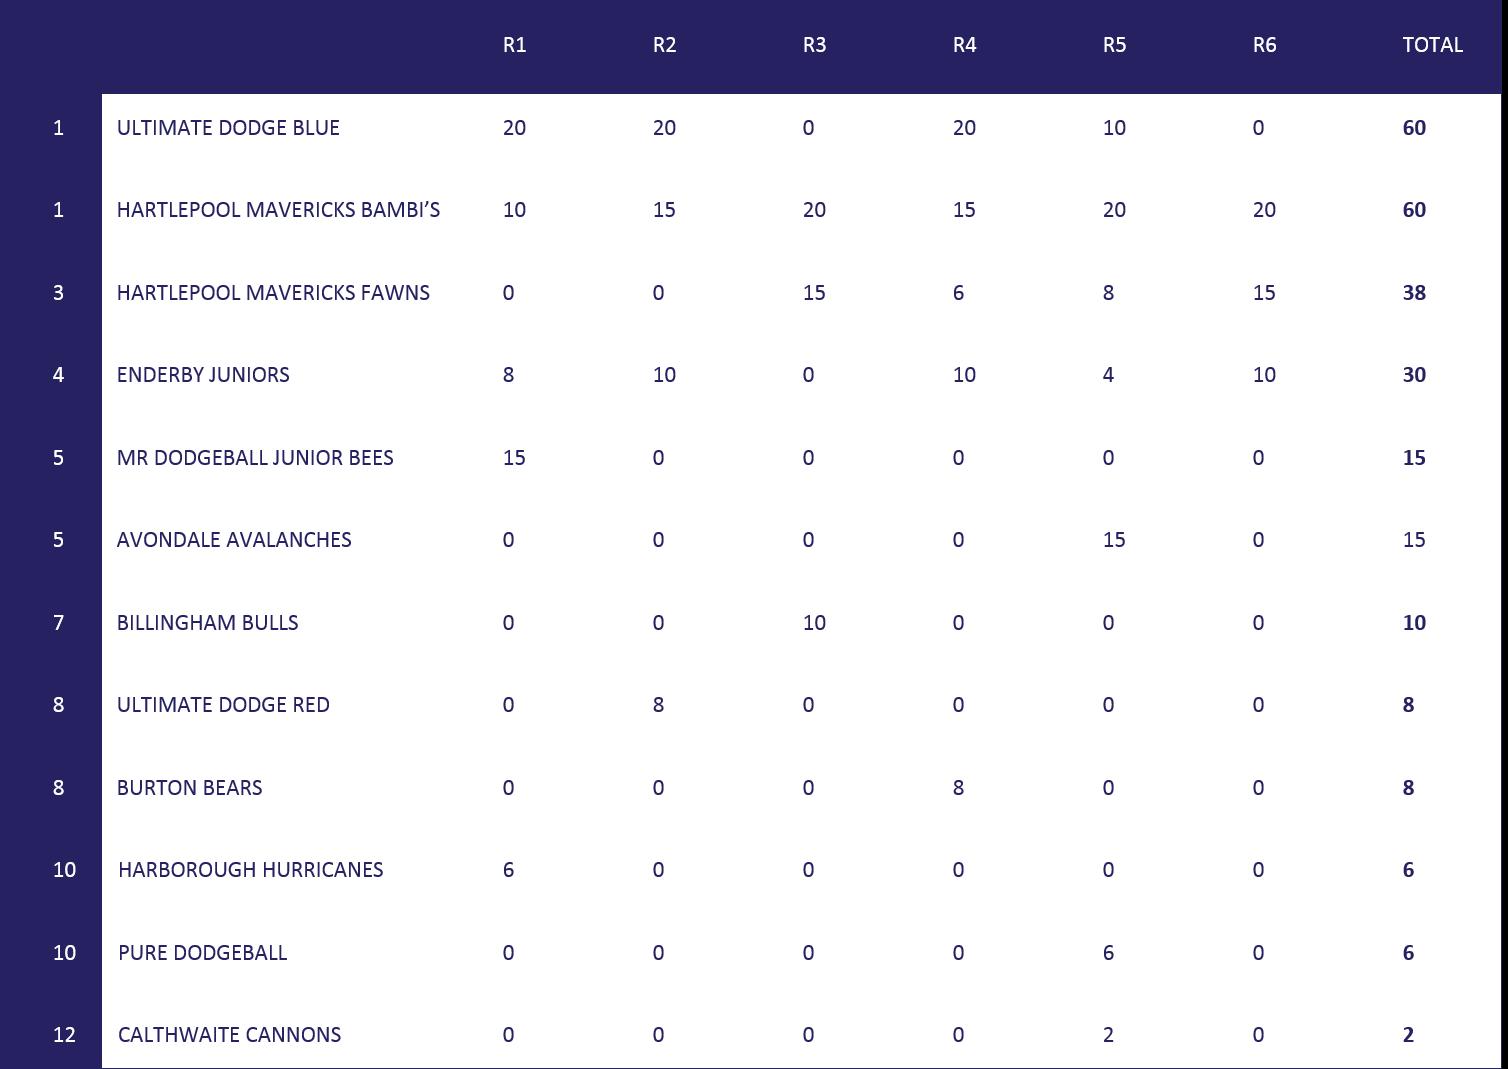 U11S FINAL TABLE